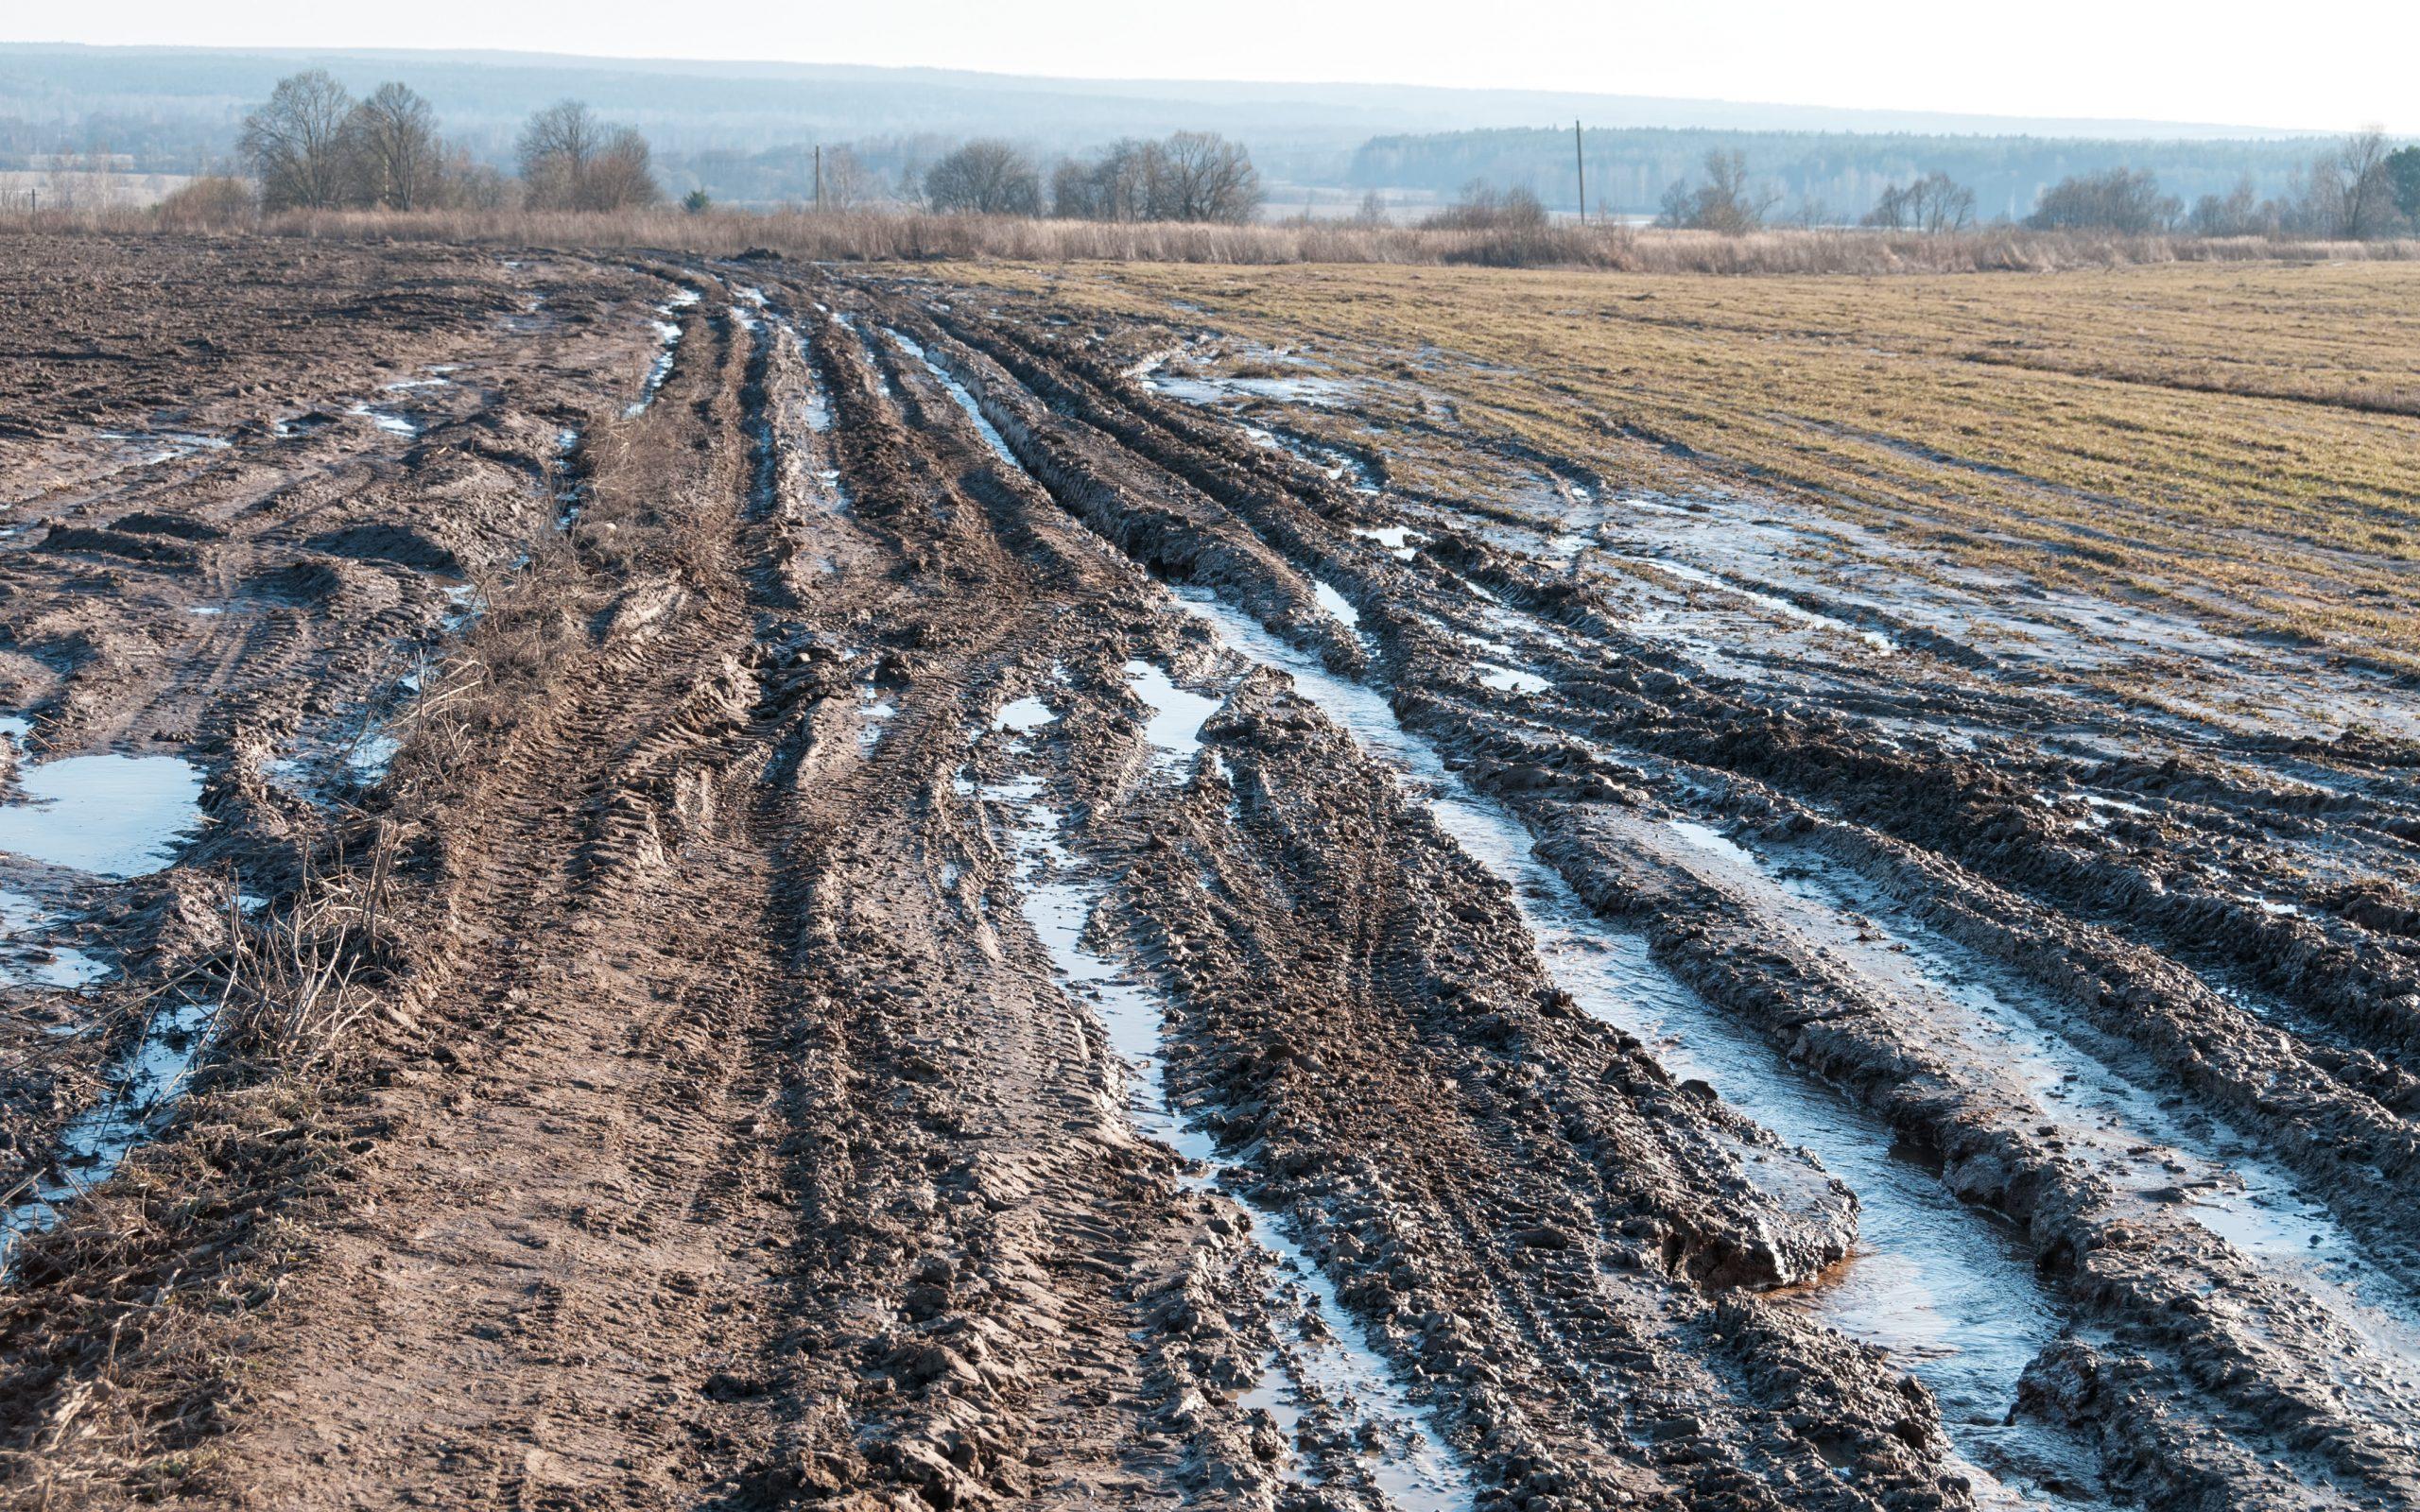 RV Stuck Muddy Road